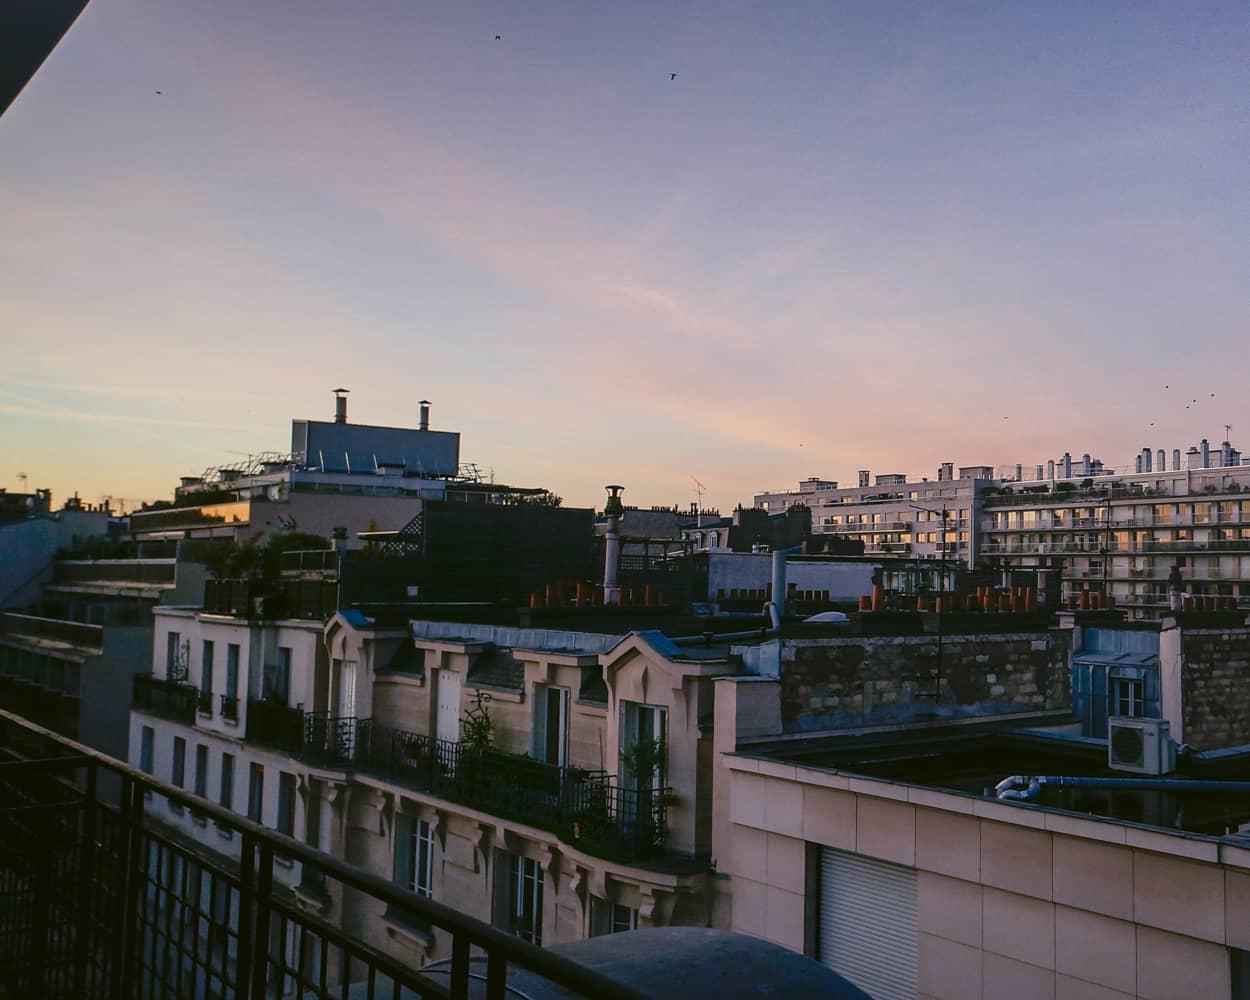 Paris-1 ホテルの部屋から見る朝日